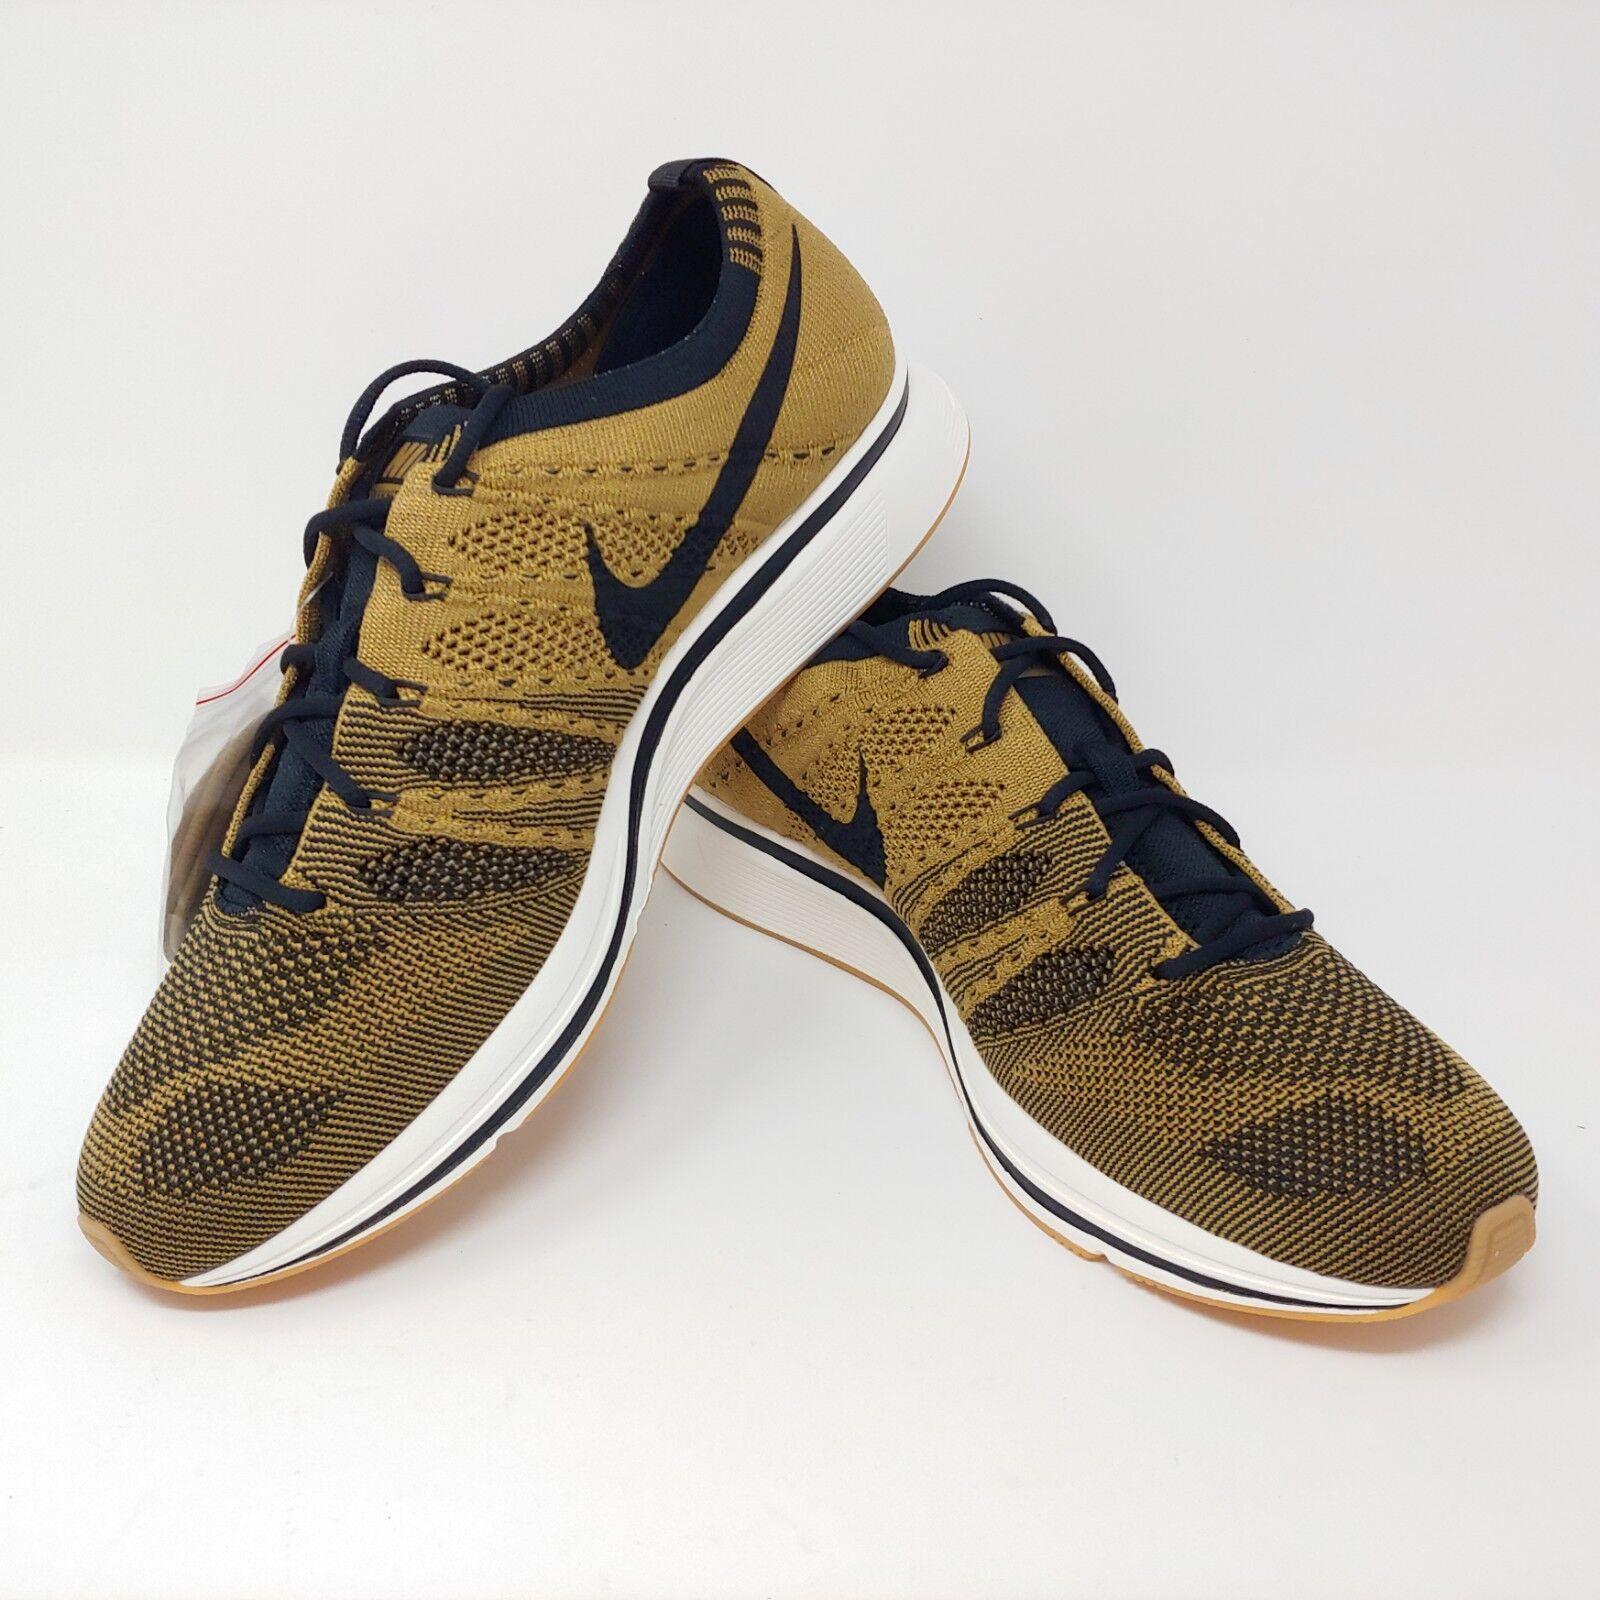 Nike Flyknit Trainer golden Beige Black Brown Running Shows Mens Size 10.5